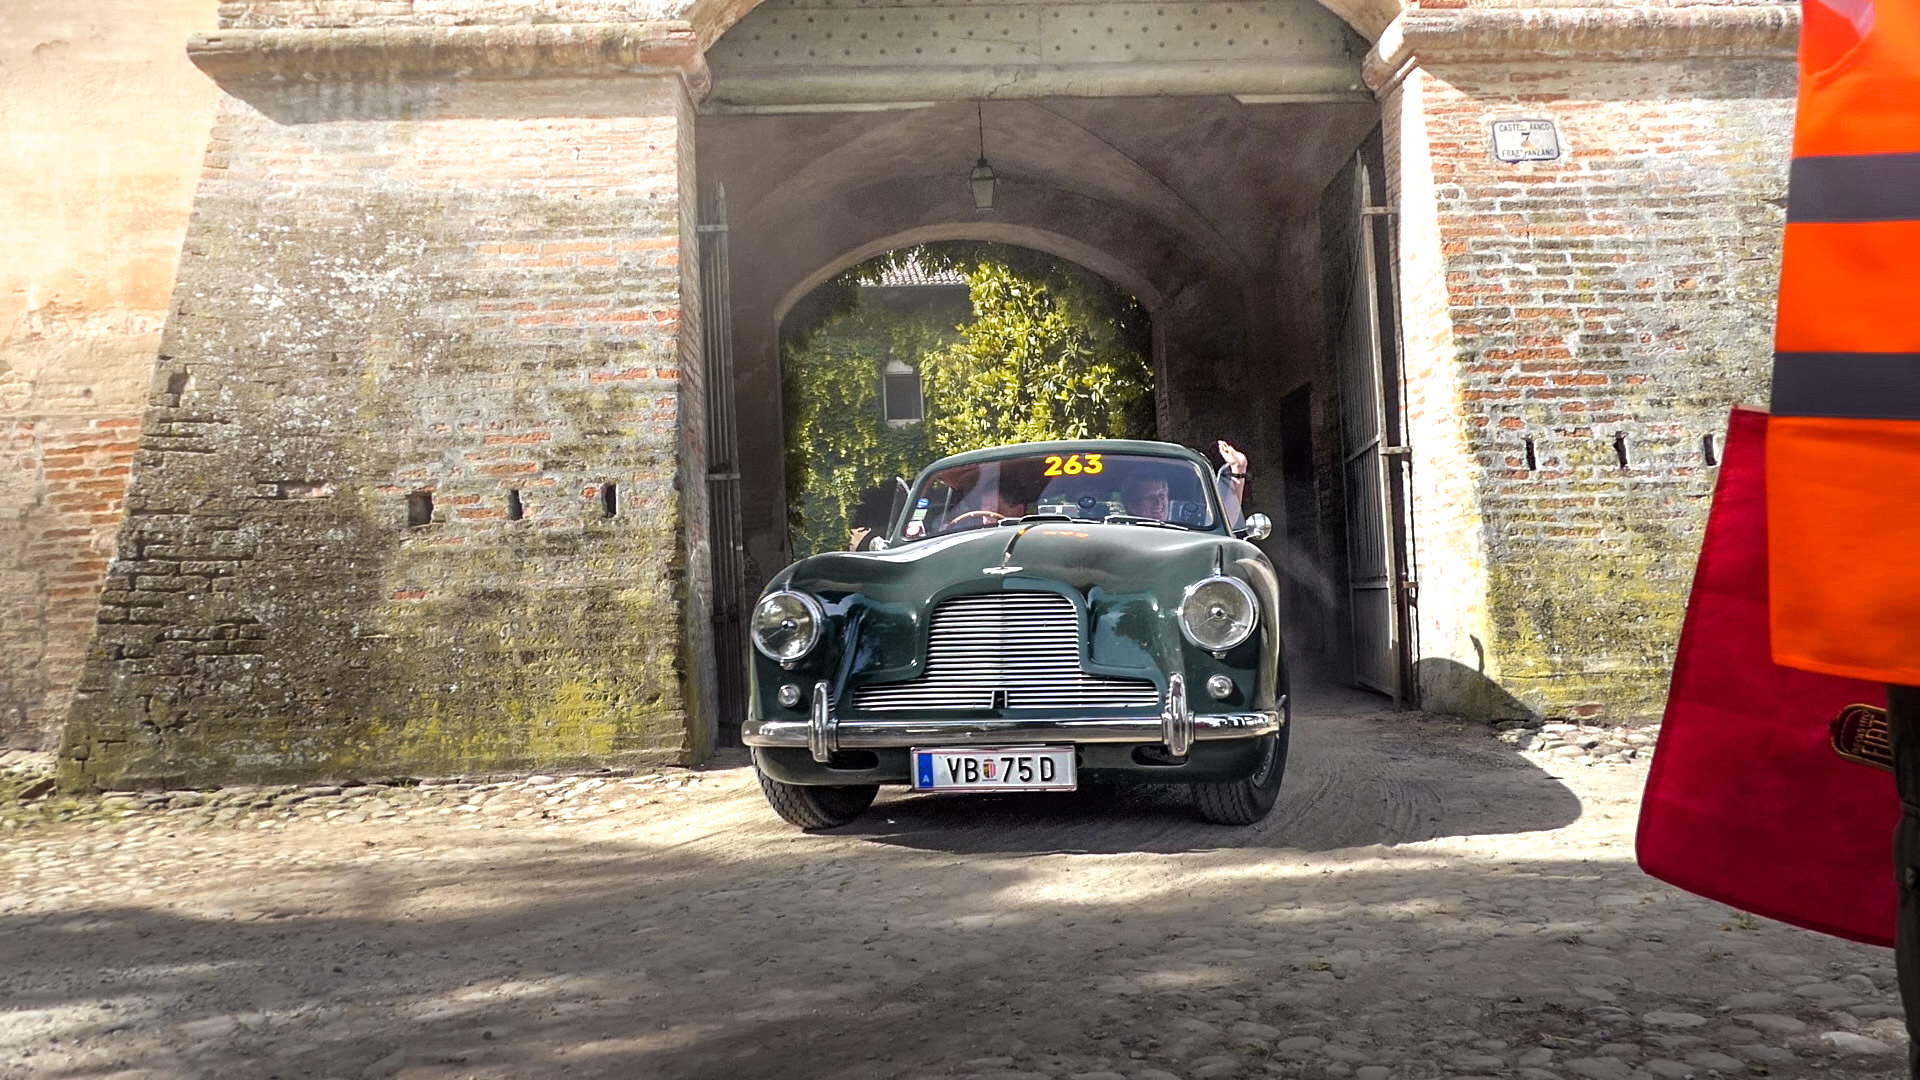 Aston Martin DB2 - VB-75-D (AUT)